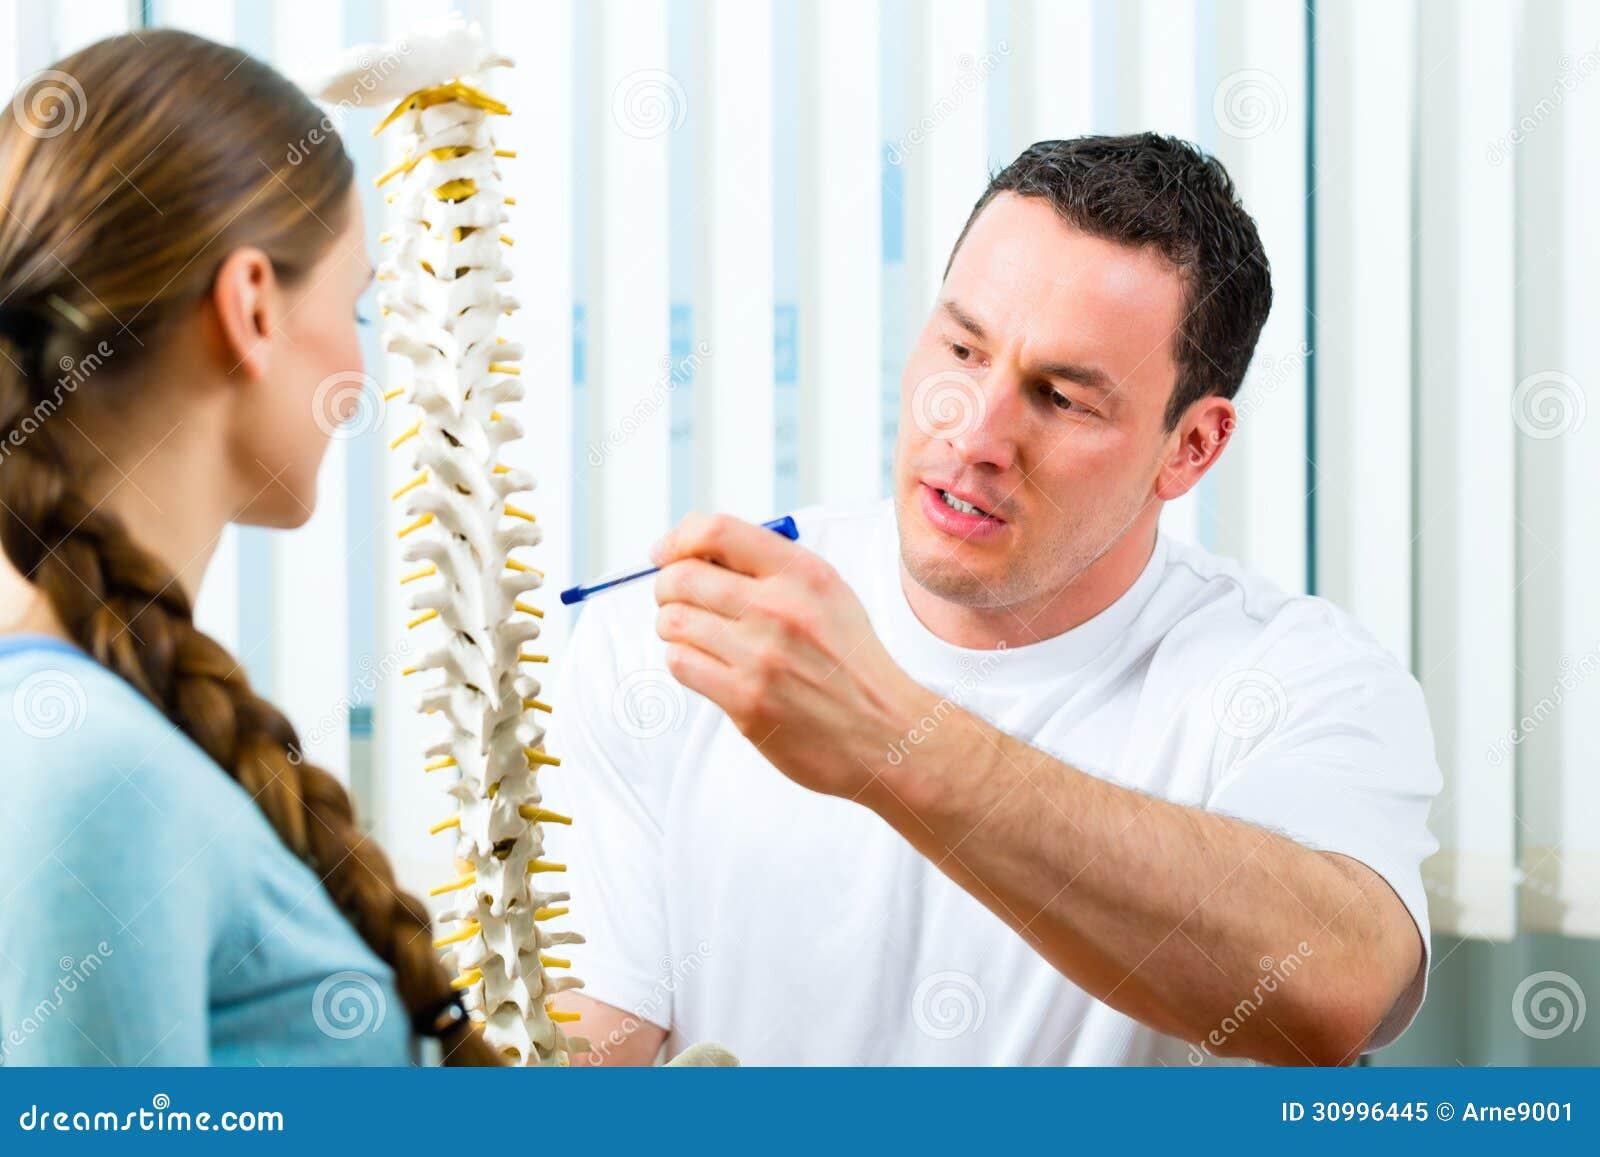 Rat - Patient an der Physiotherapie